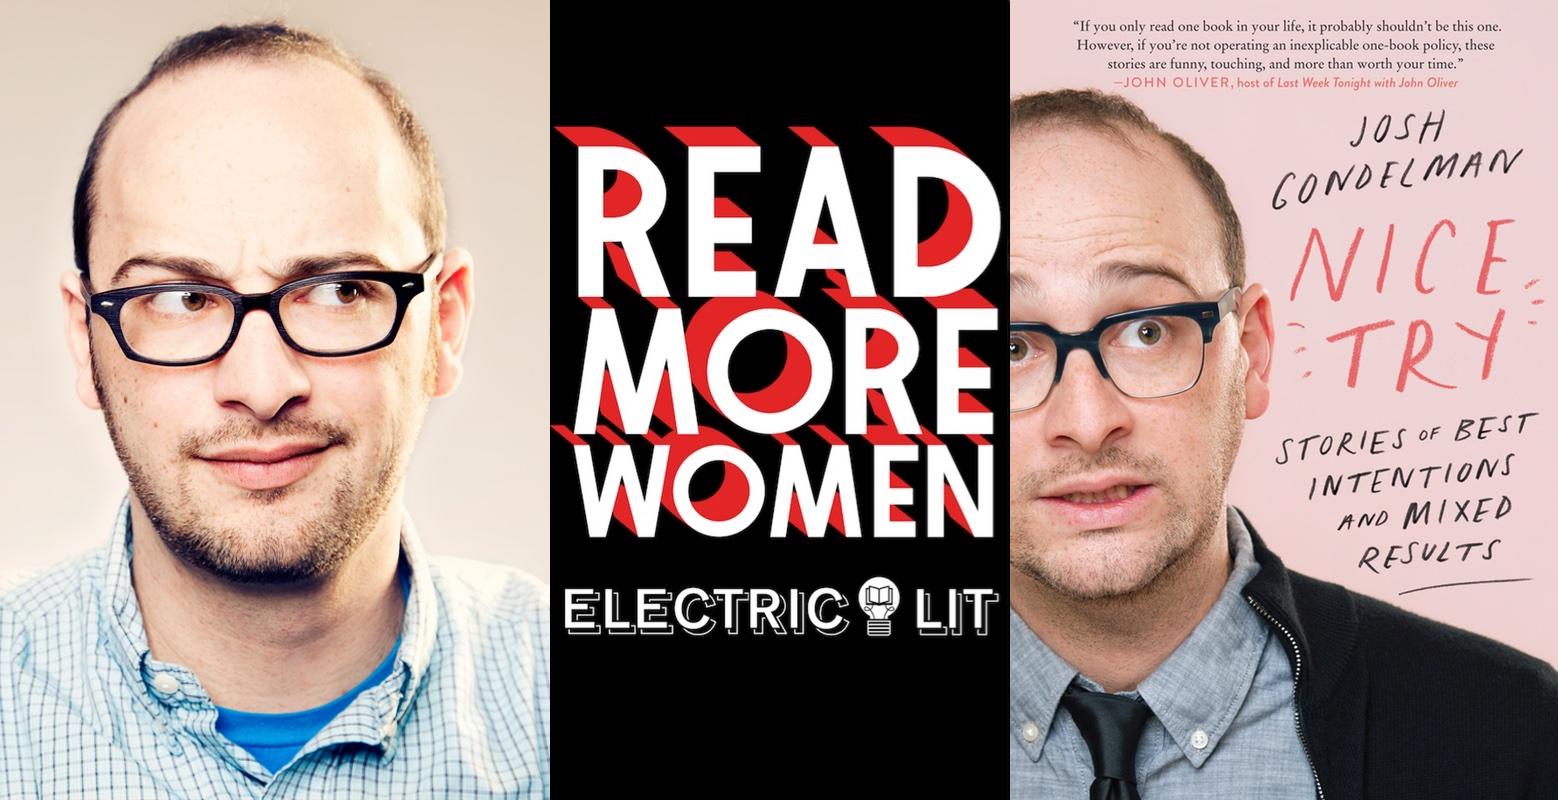 Josh Gondelman Recommends 5 Hilarious Books By Women